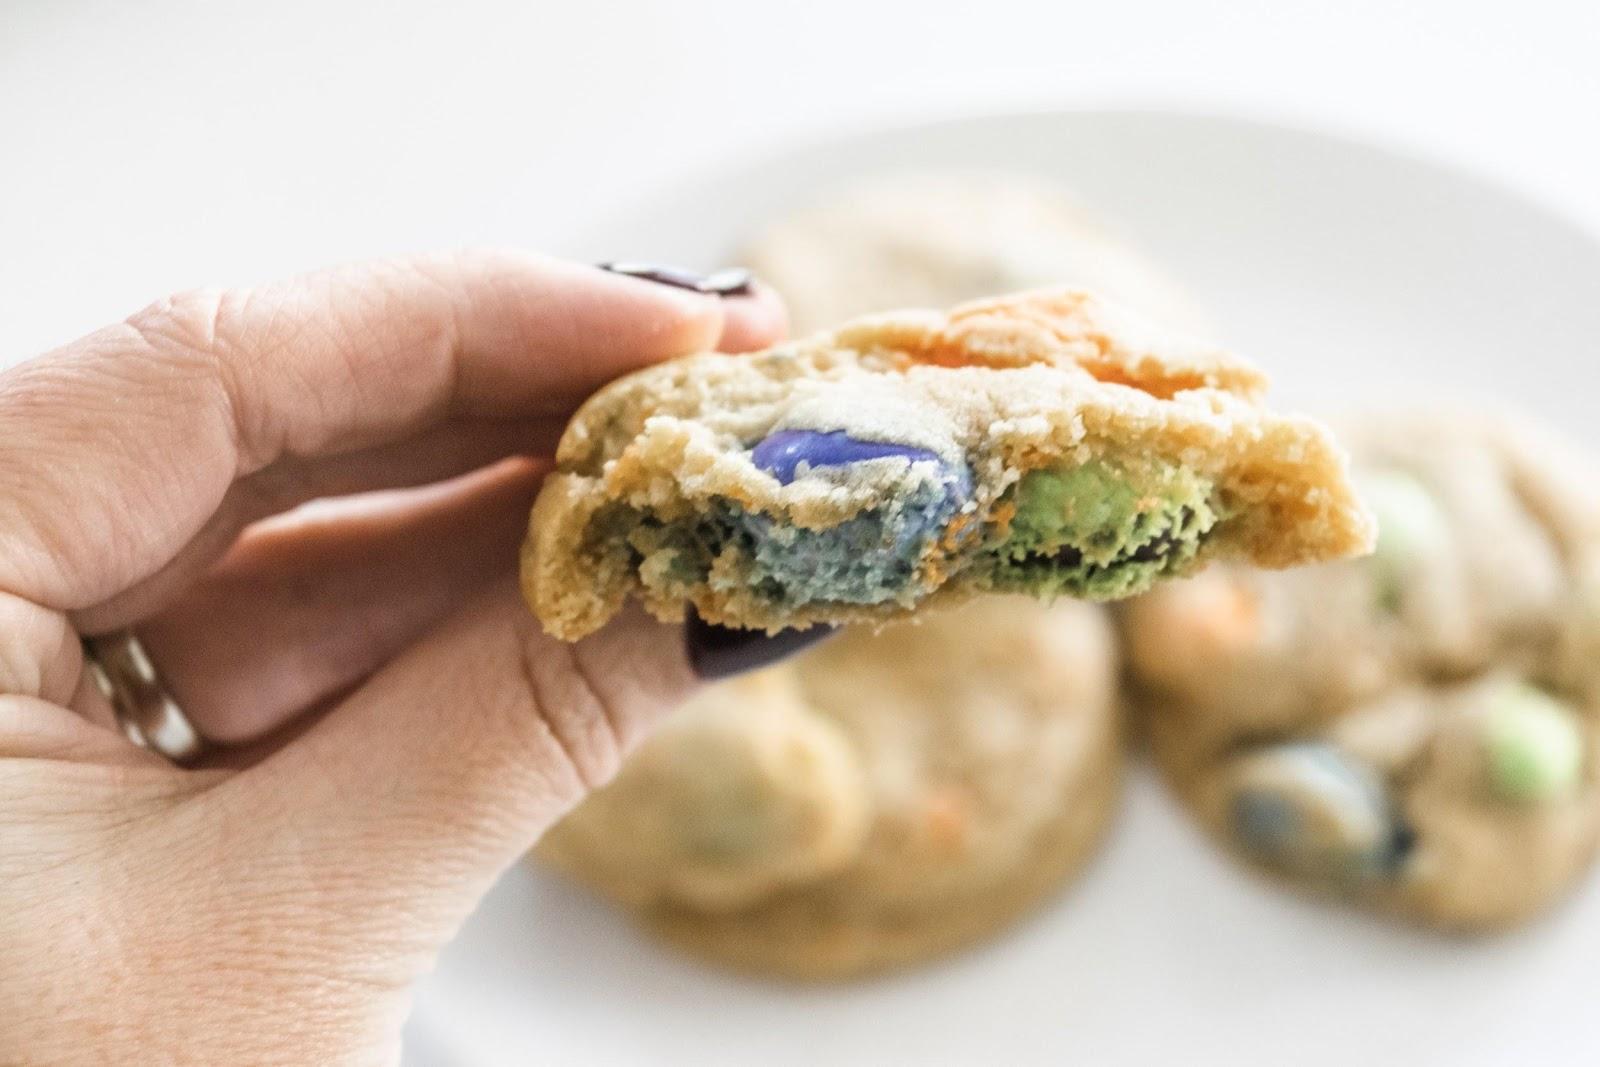 Mason Jar M&M'S Ghoul Cookies